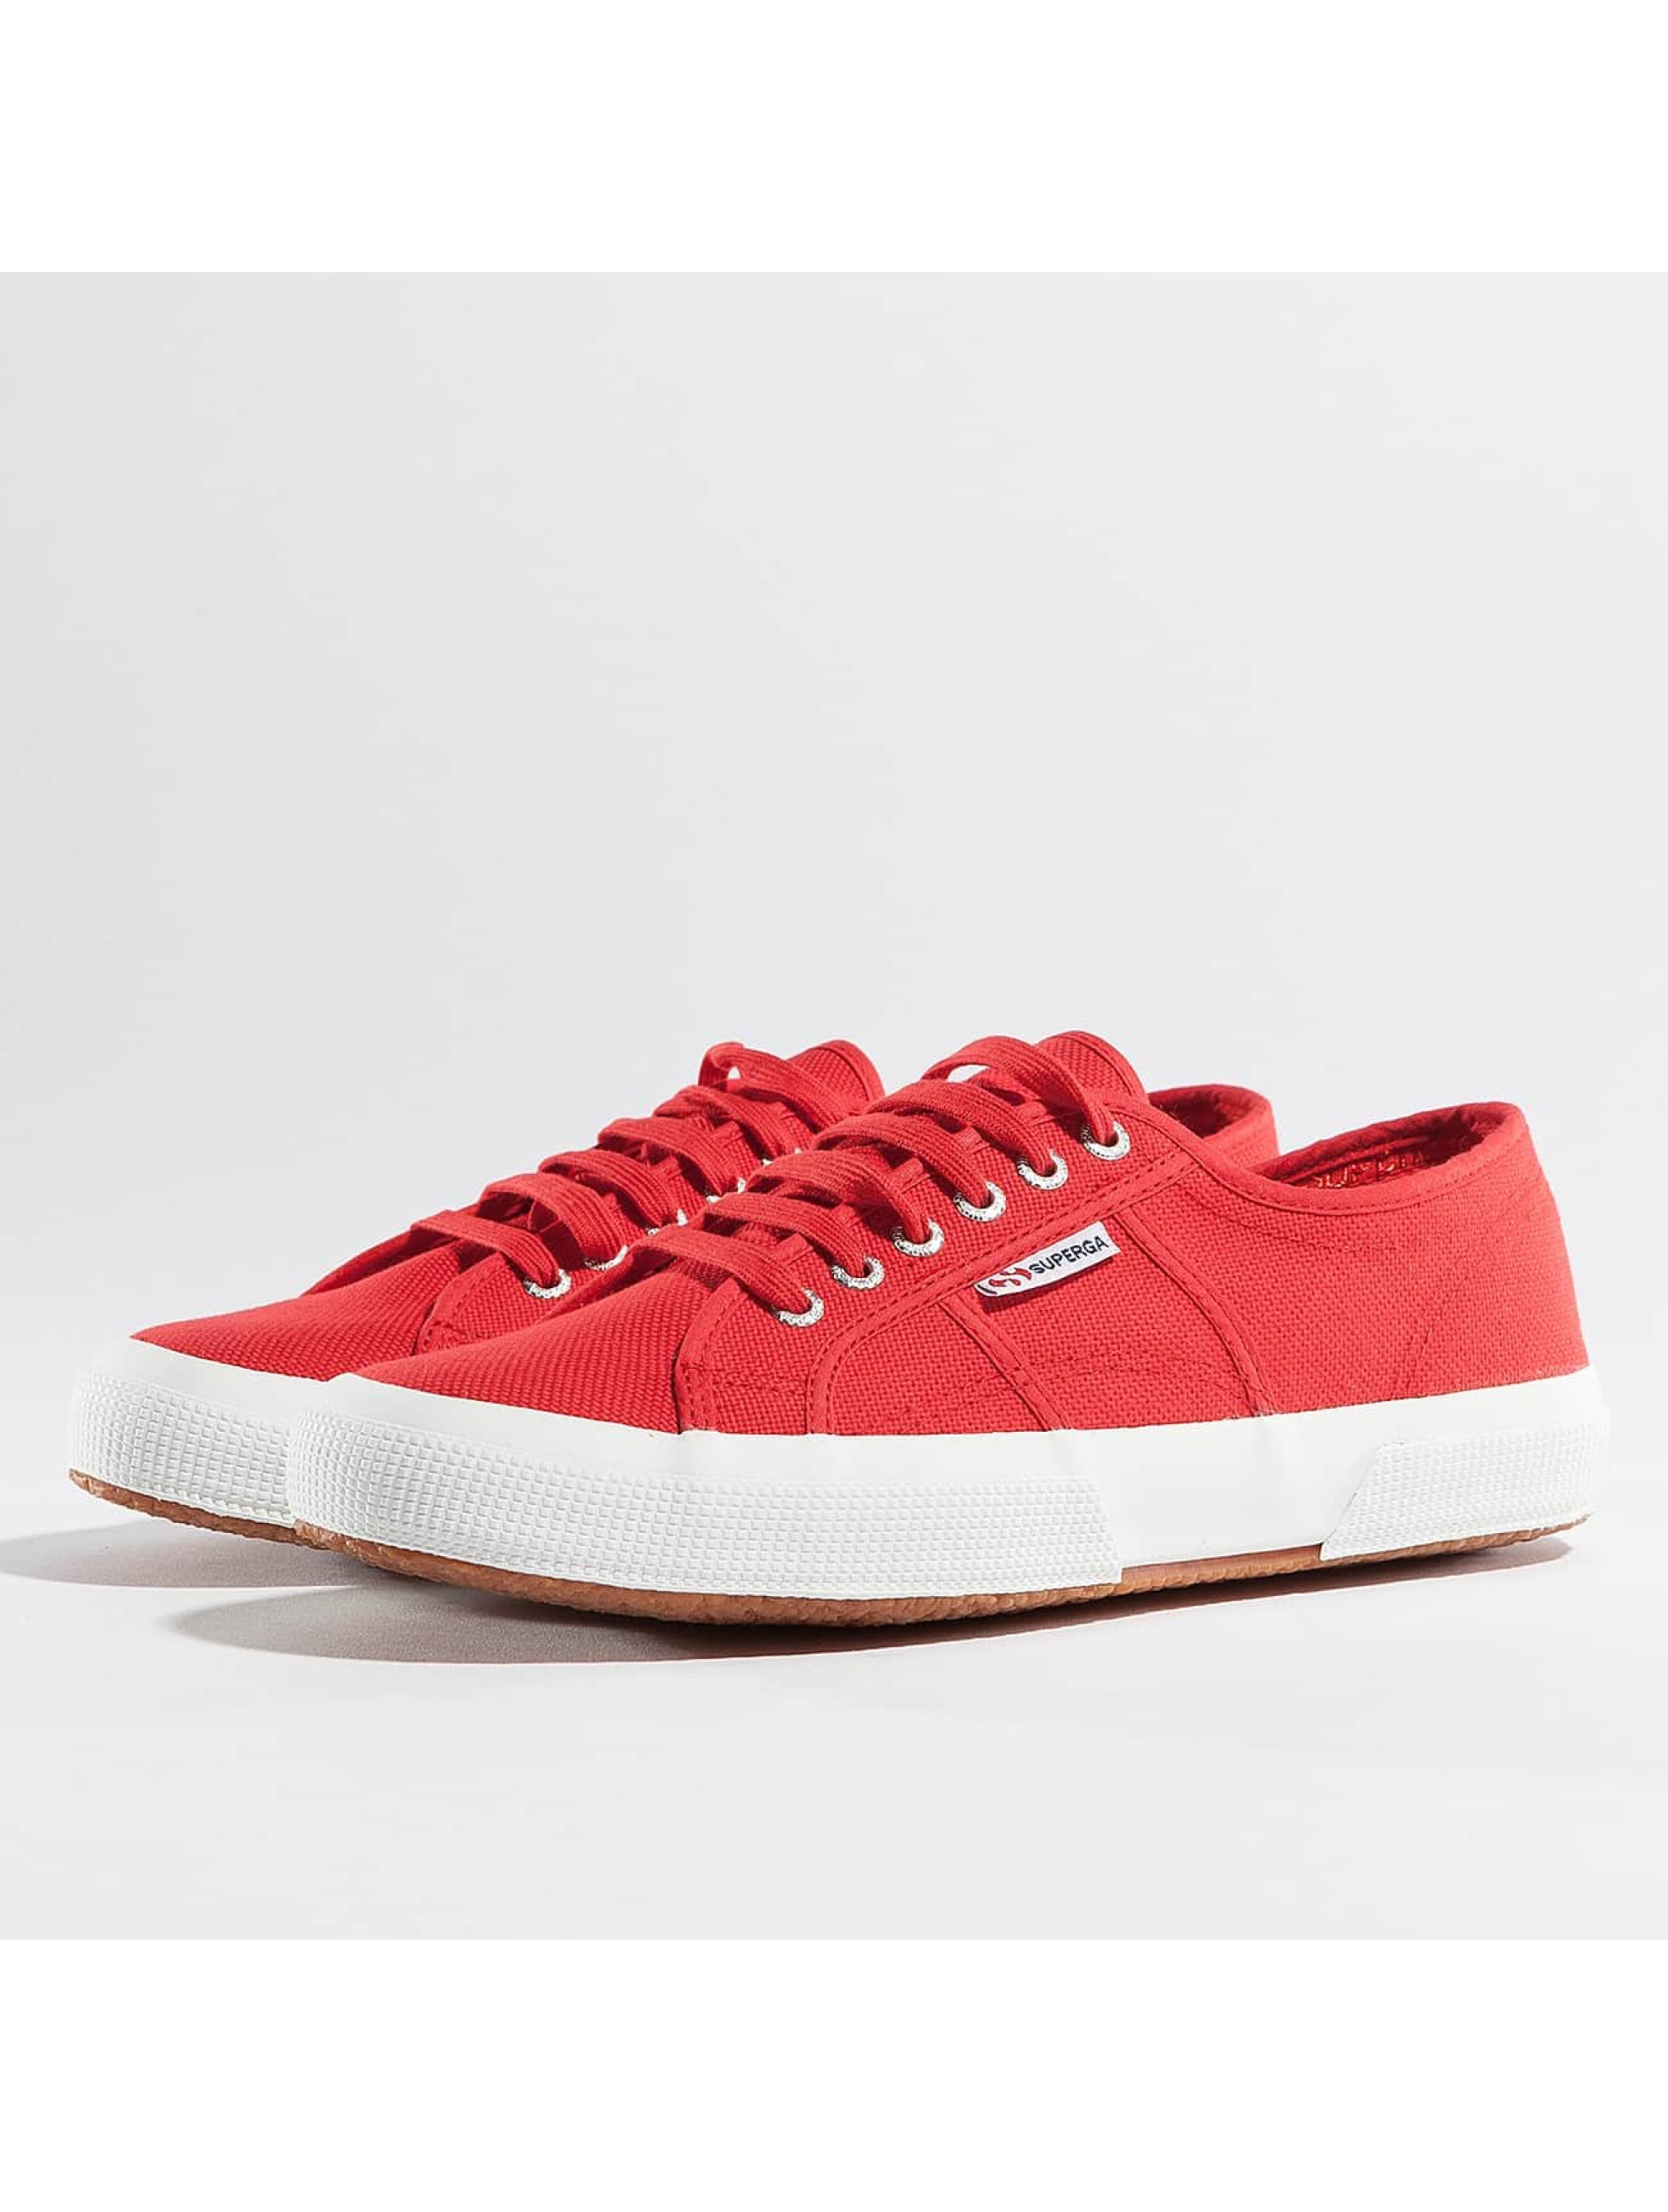 Superga Männer,Frauen Sneaker 2750 Cotu in rot